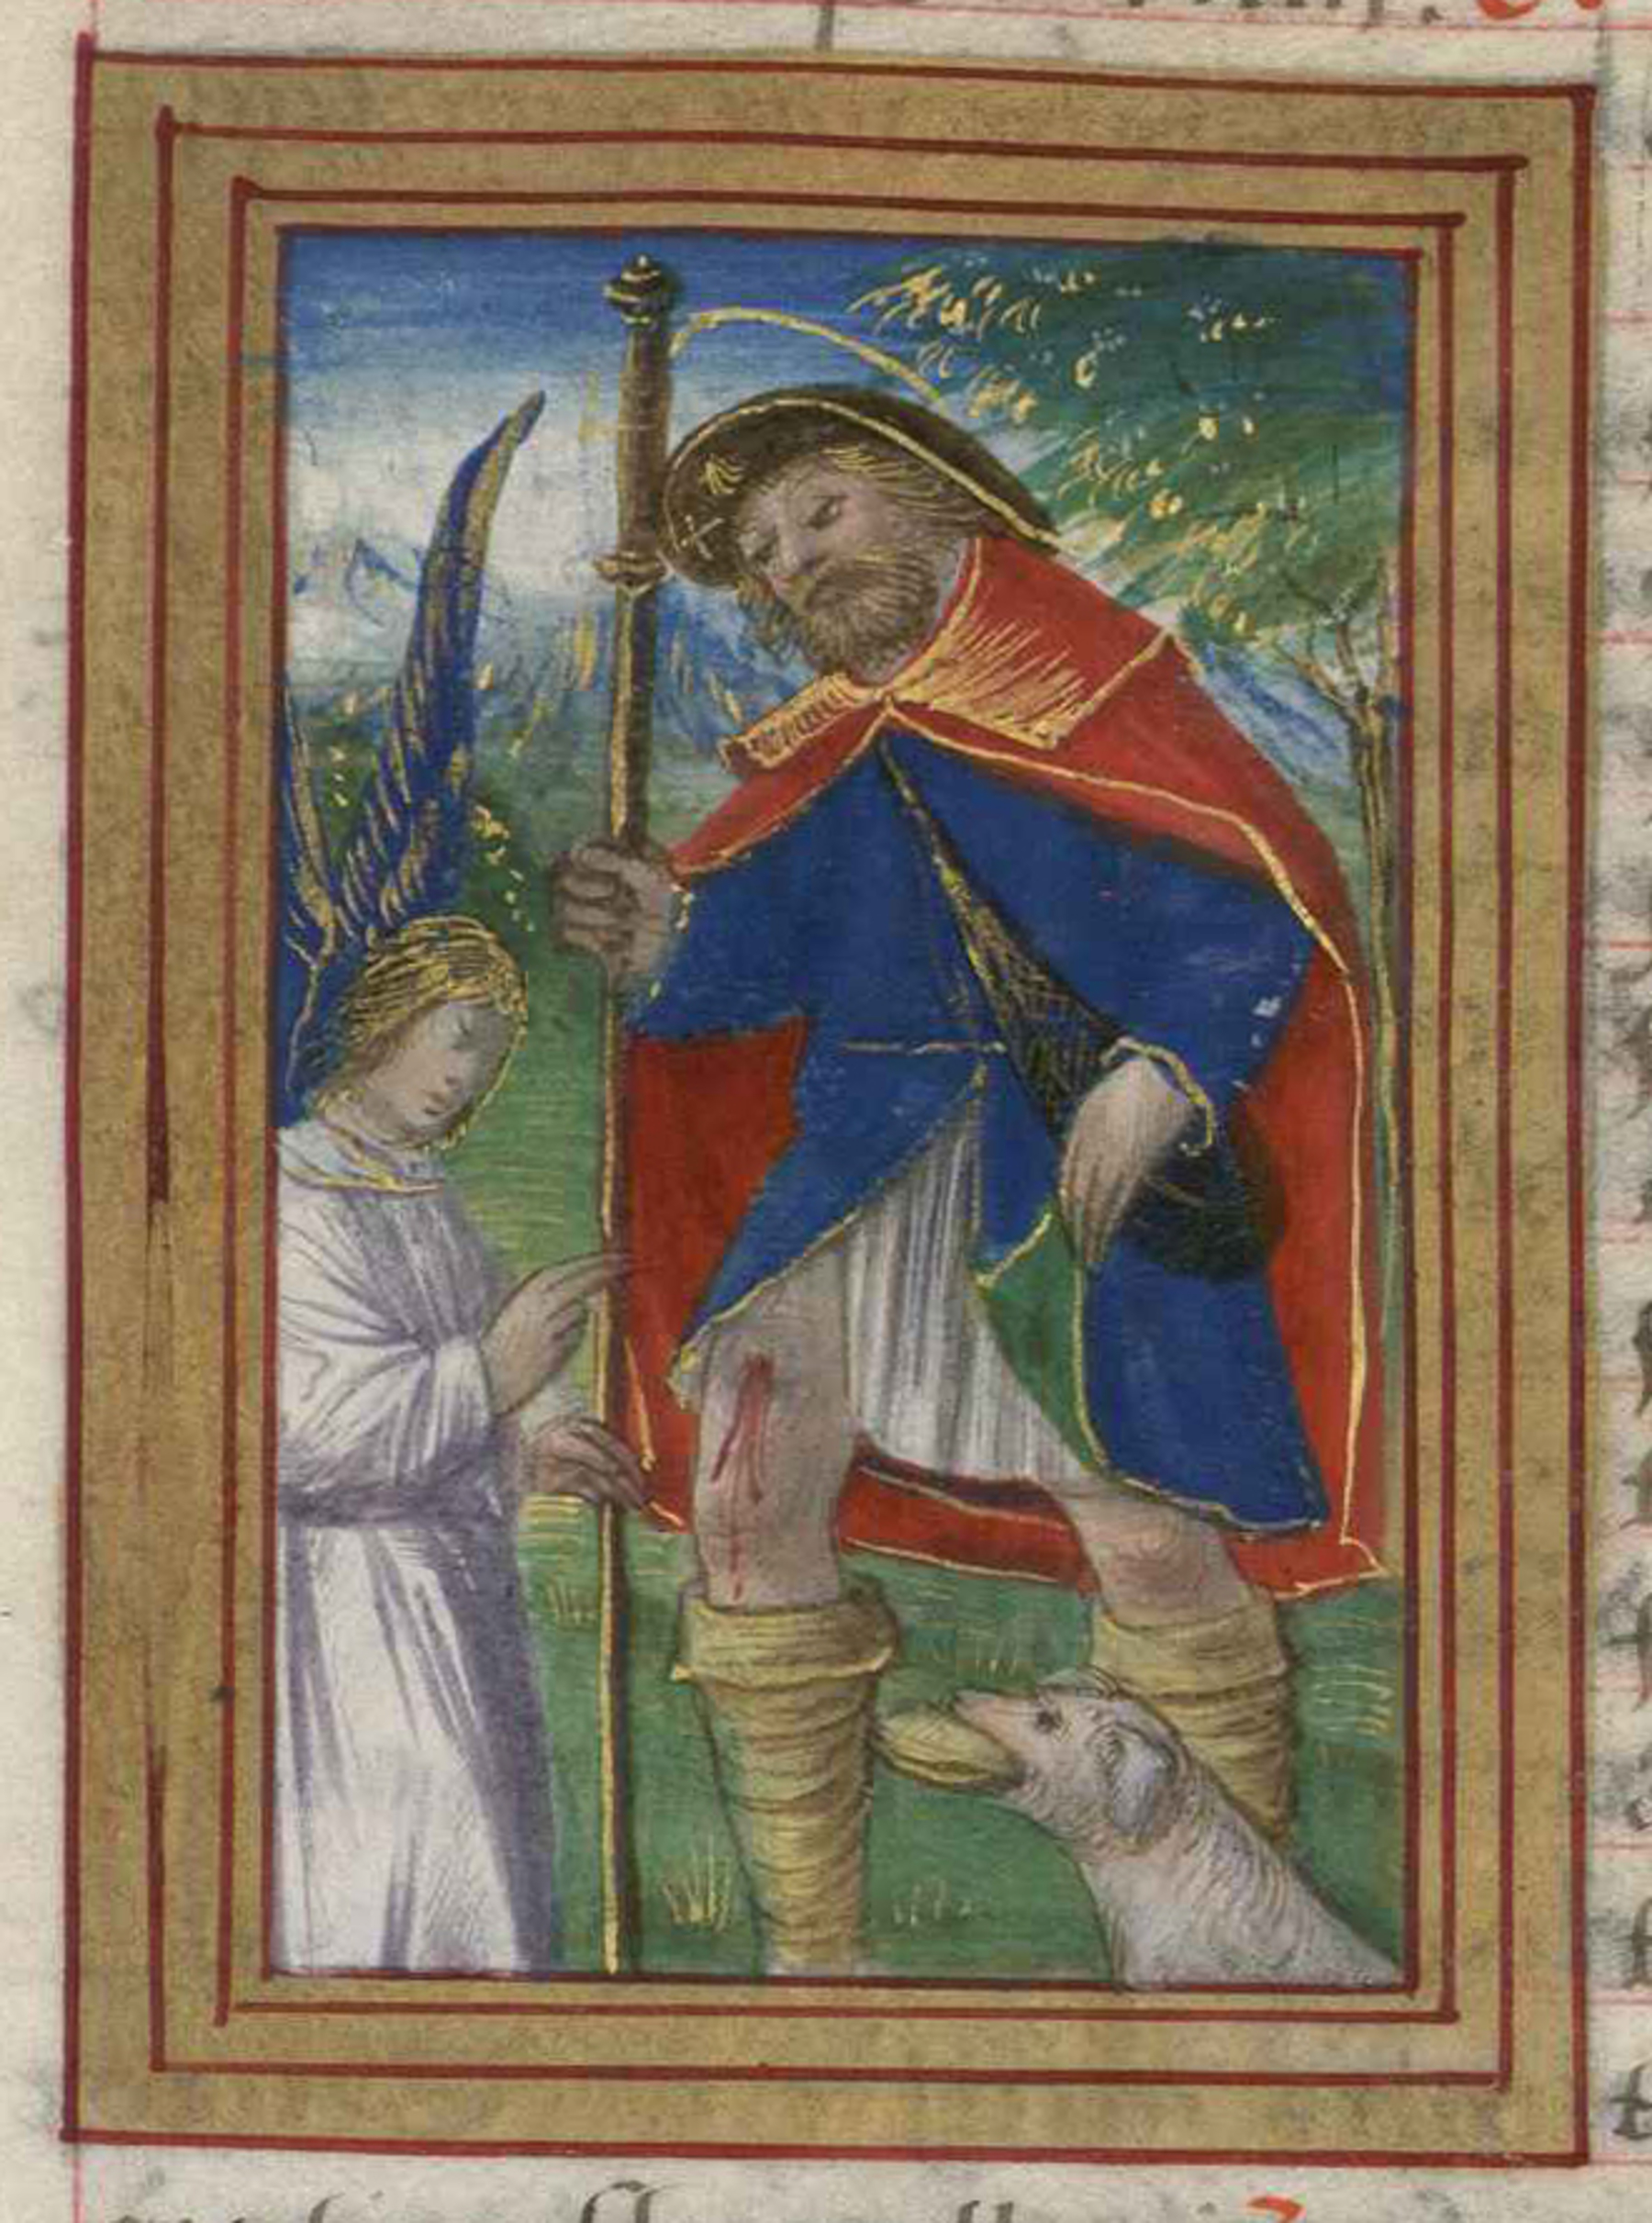 Contenu du Saint Roch